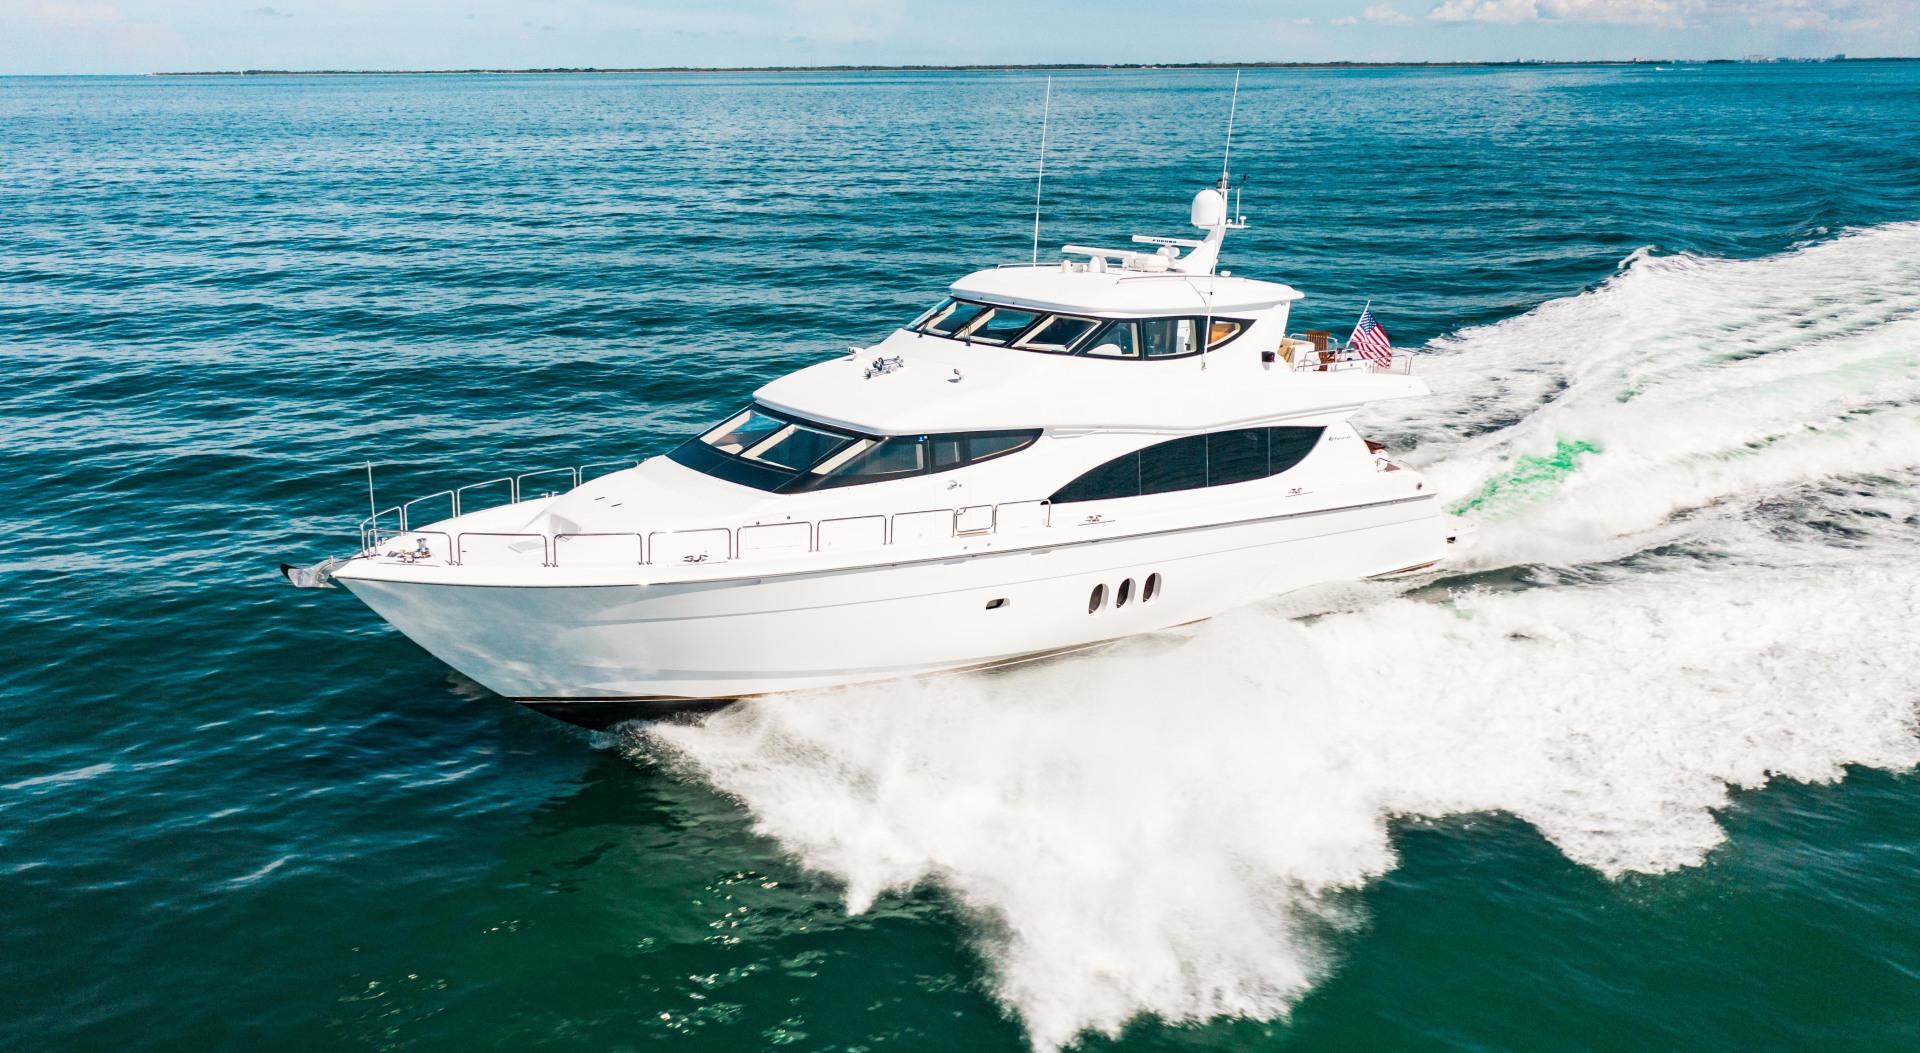 Hatteras-80 Motor Yacht 2008-Galati Yacht Sales Trade Anna Maria-Florida-United States-2008 Hatteras 80 Motor Yacht  Galati Yacht Sales Trade-1466279 | Thumbnail